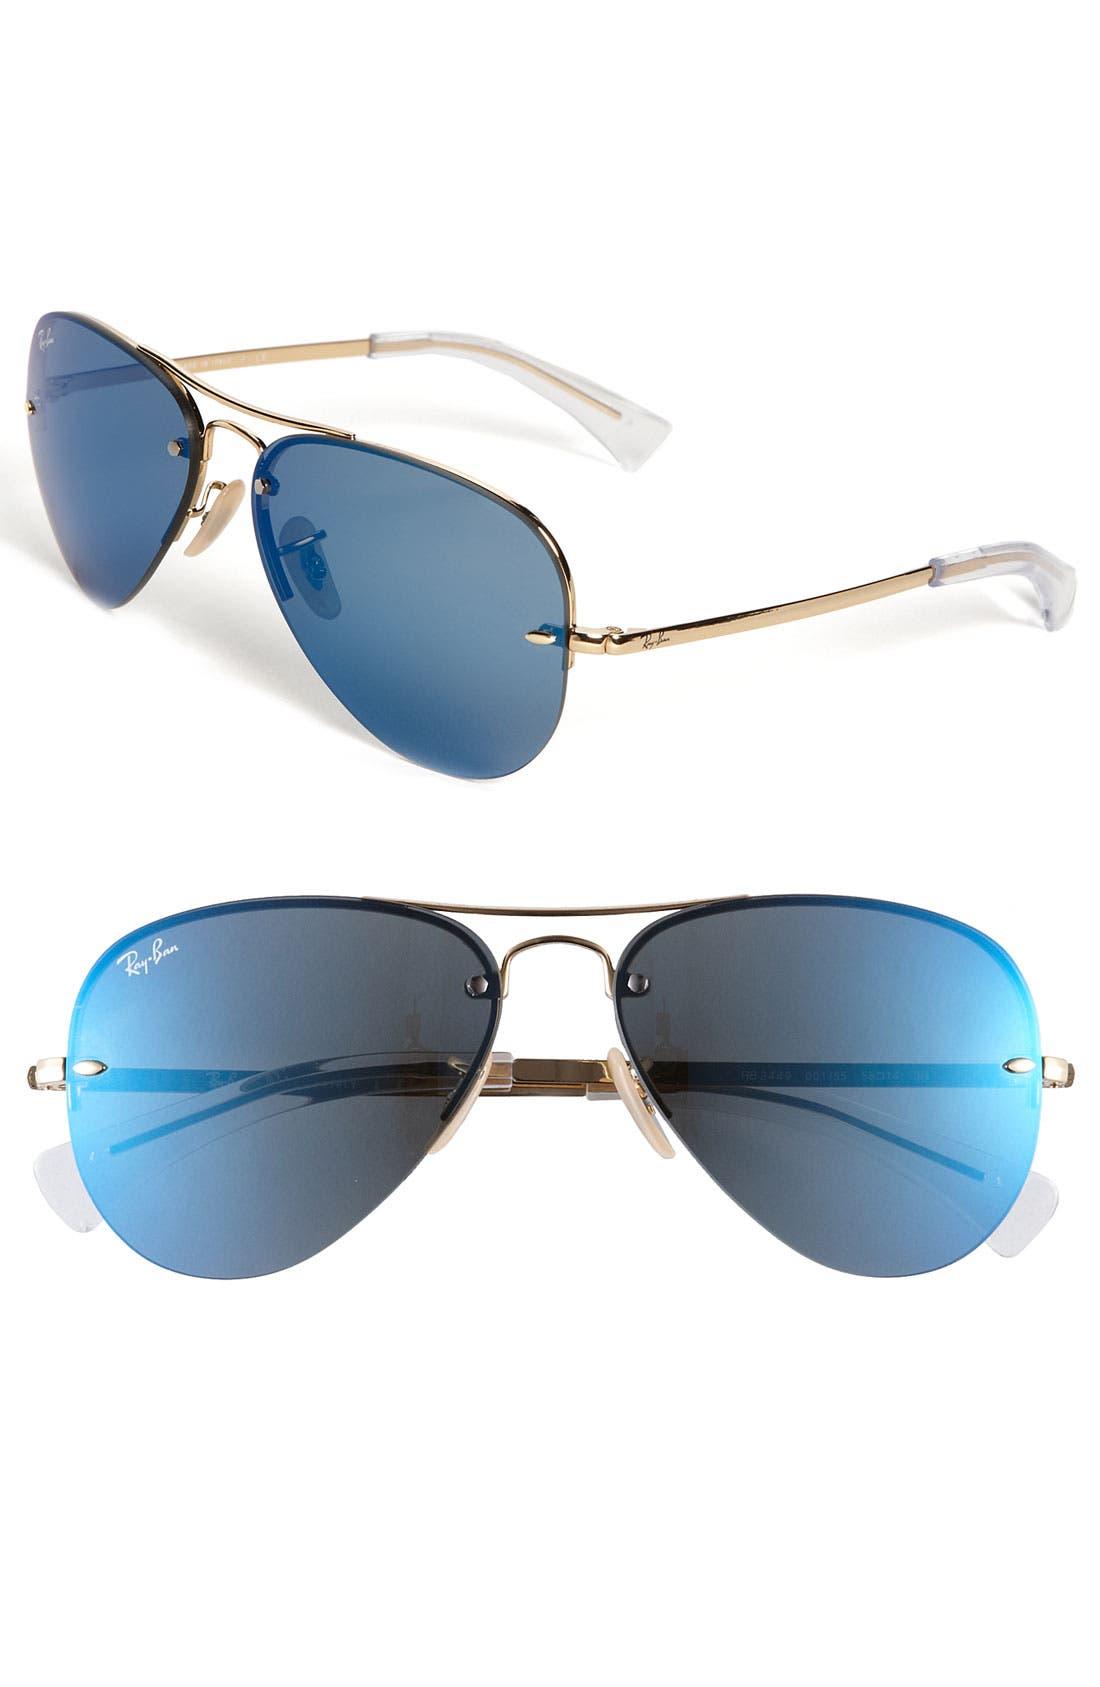 Alternate Image 1 Selected - Ray-Ban 56mm Semi Rimless Lightweight Aviator Sunglasses